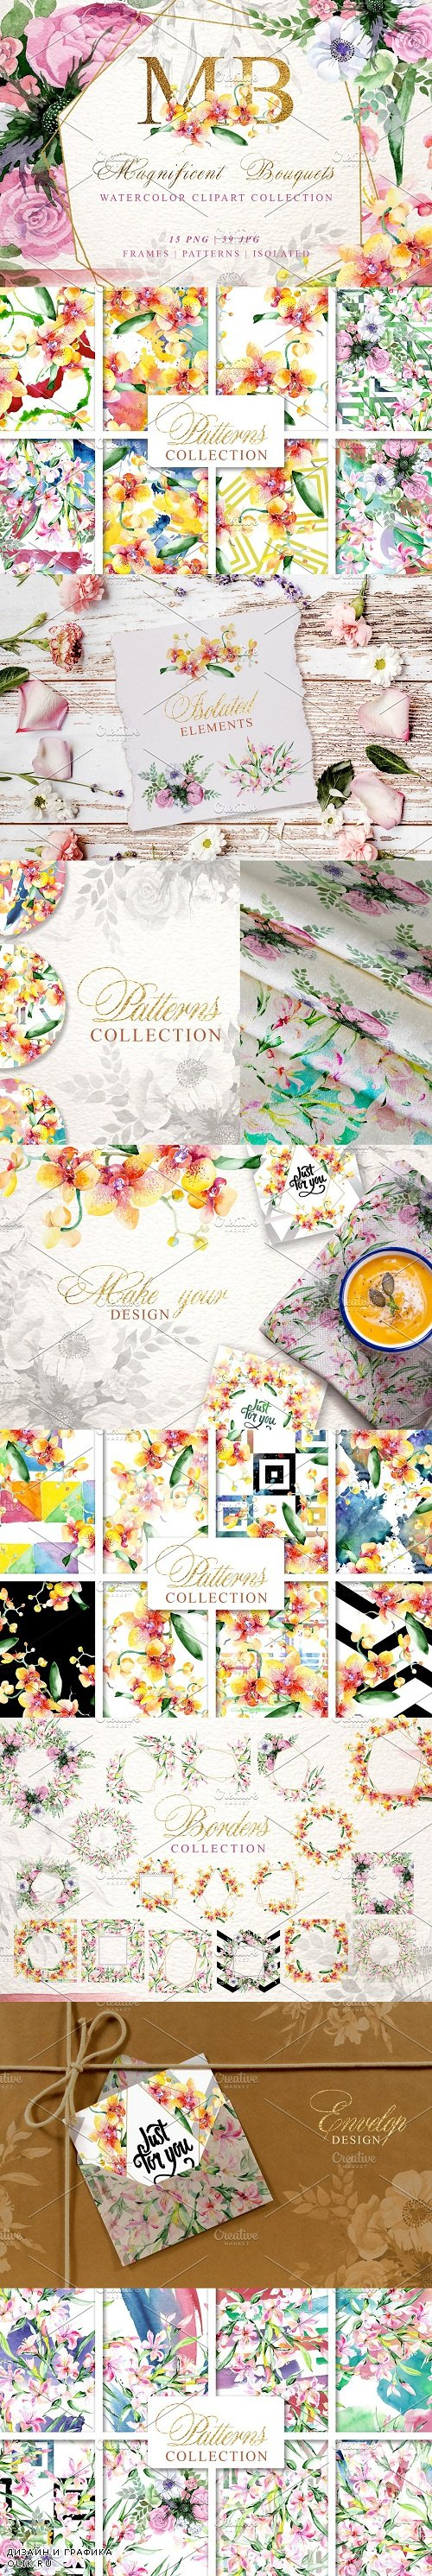 Magnificent Bouquets watercolor PNG - 3139590